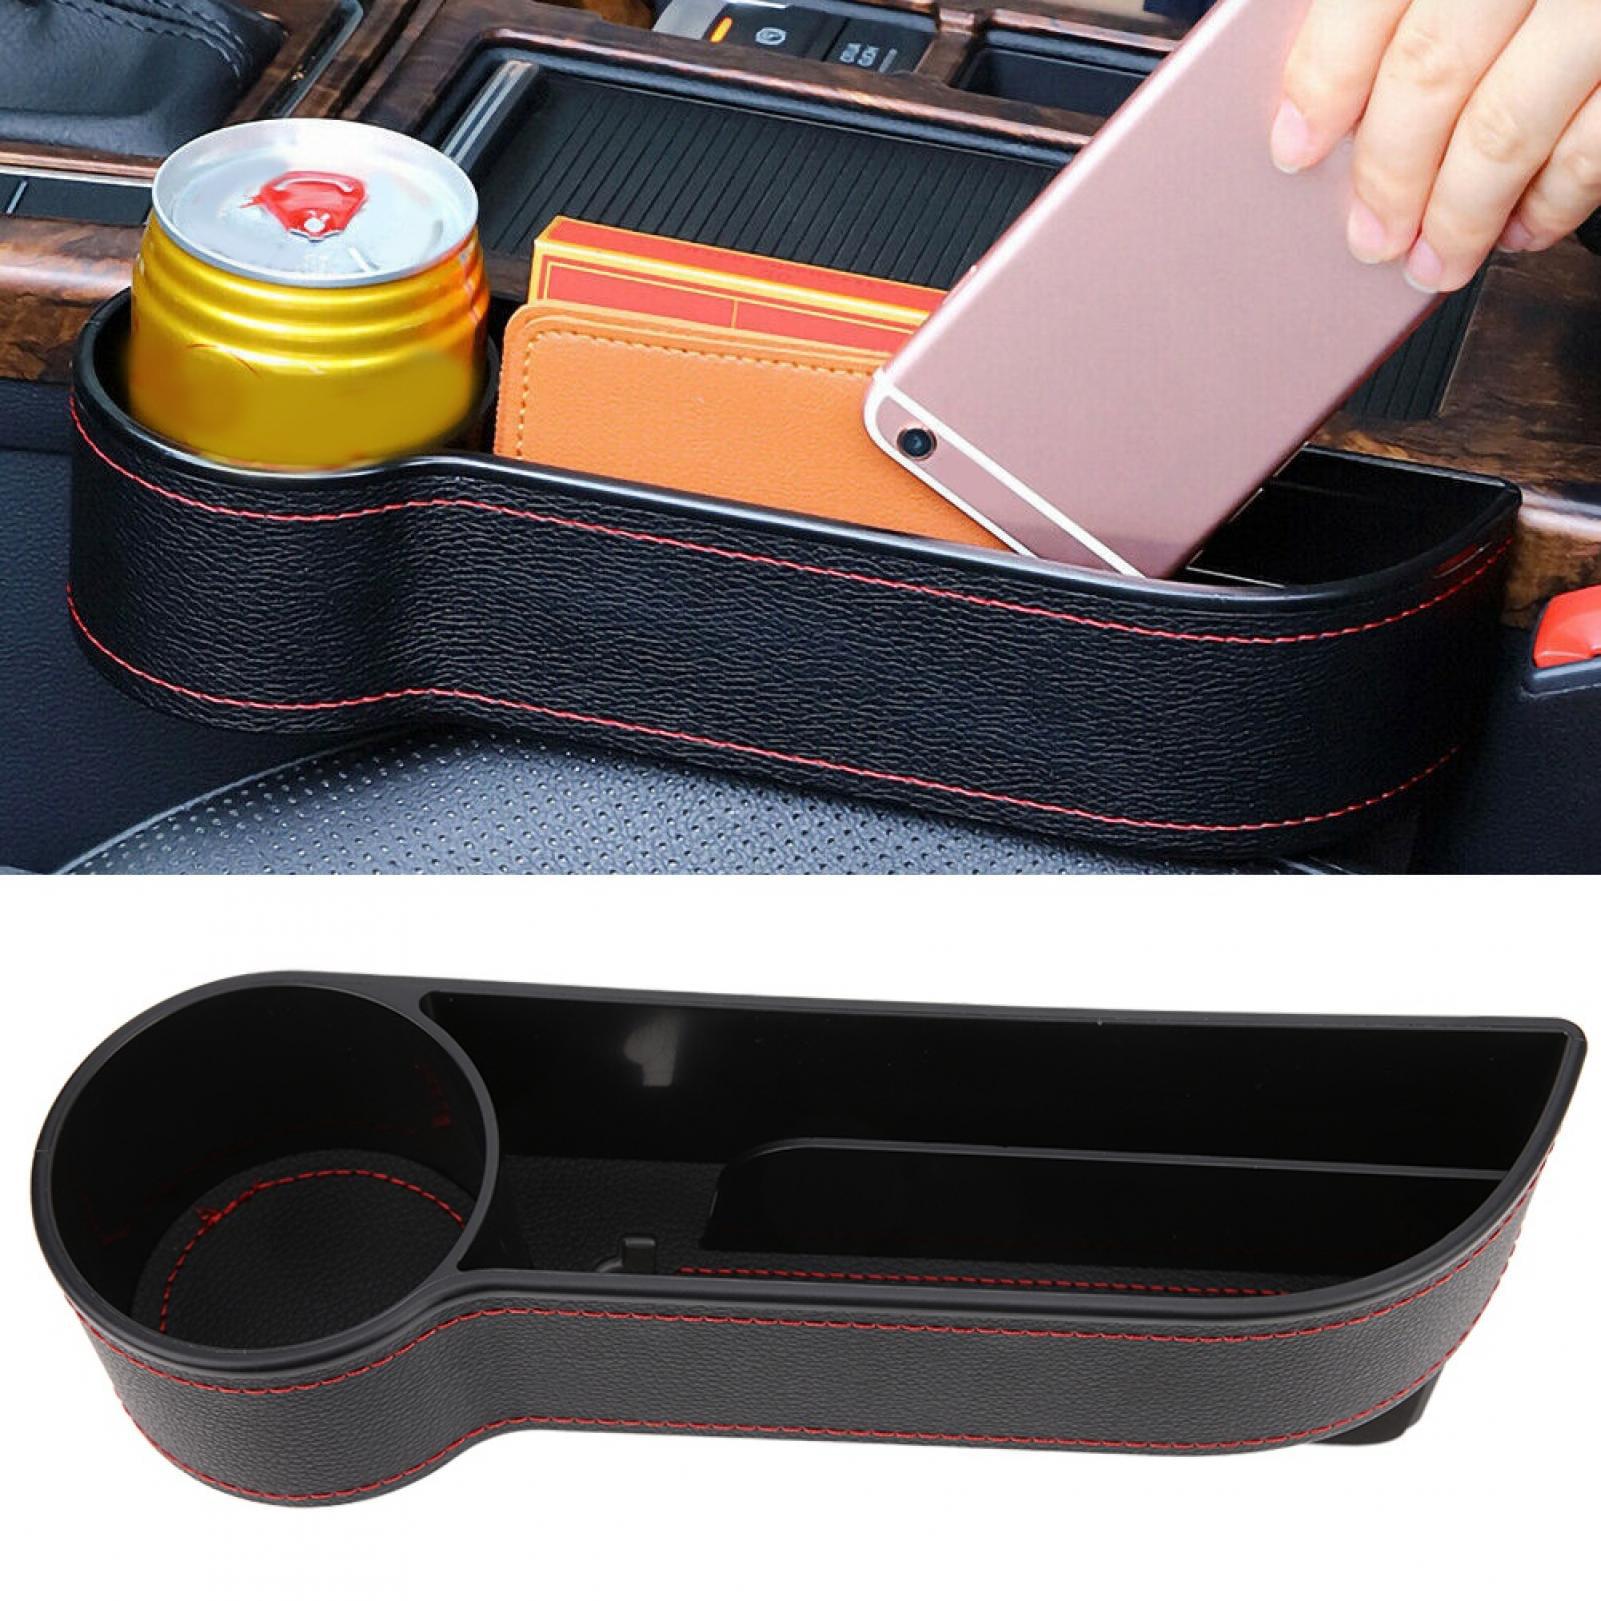 Details about  /Durable Air Outlet Multi-Function Car Debris Storage Bag With Premium Quality